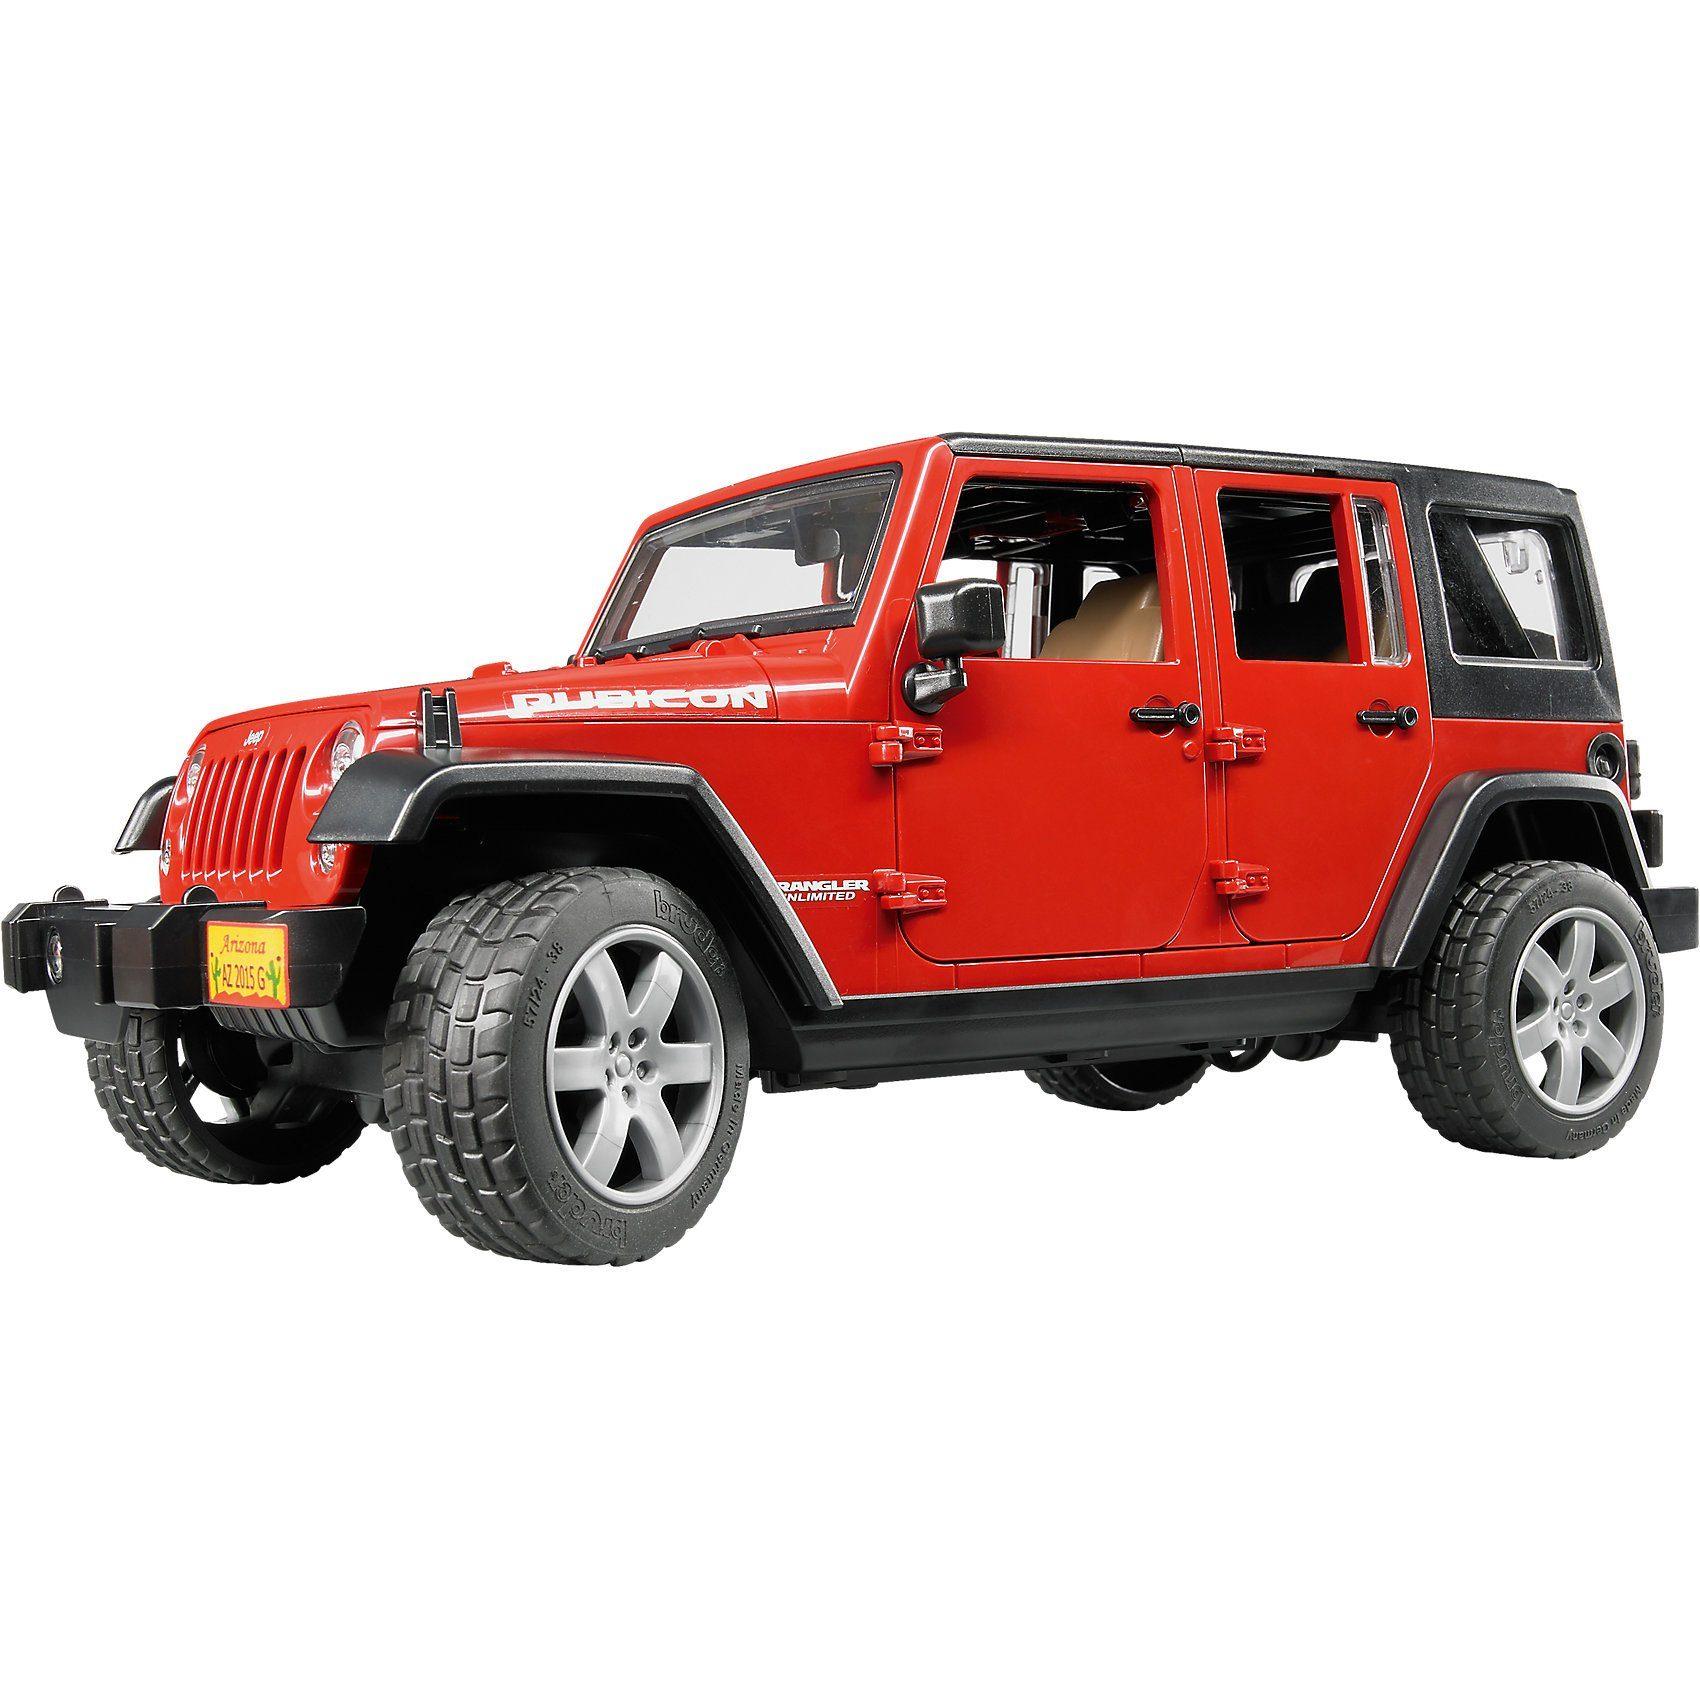 2525 Jeep Wrangler Unlimited Rubicon